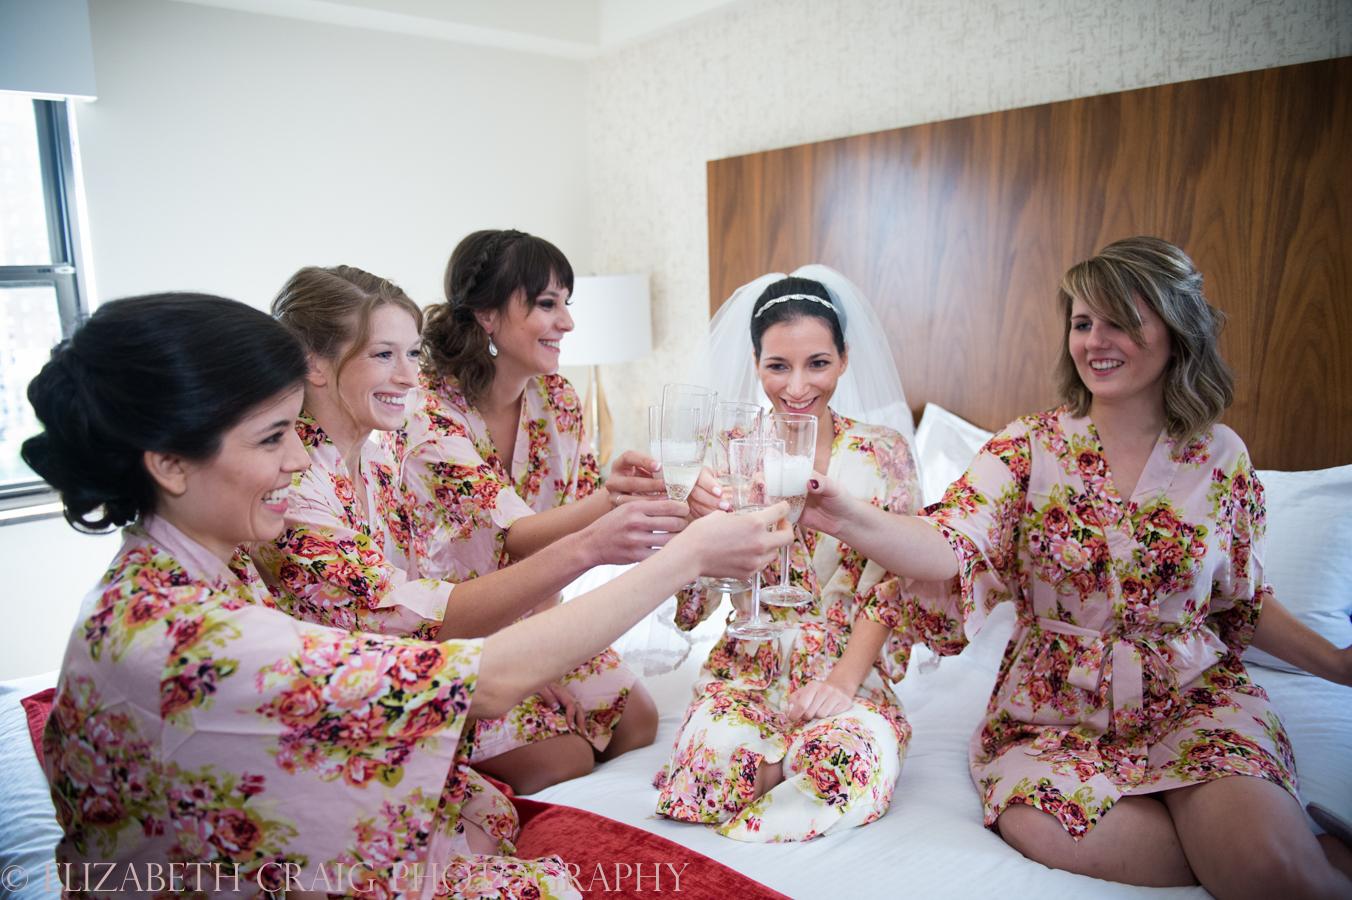 pittsburgh-wedding-photographers-doubletree-pittsburgh-sacred-heart-elizabeth-craig-photography-3